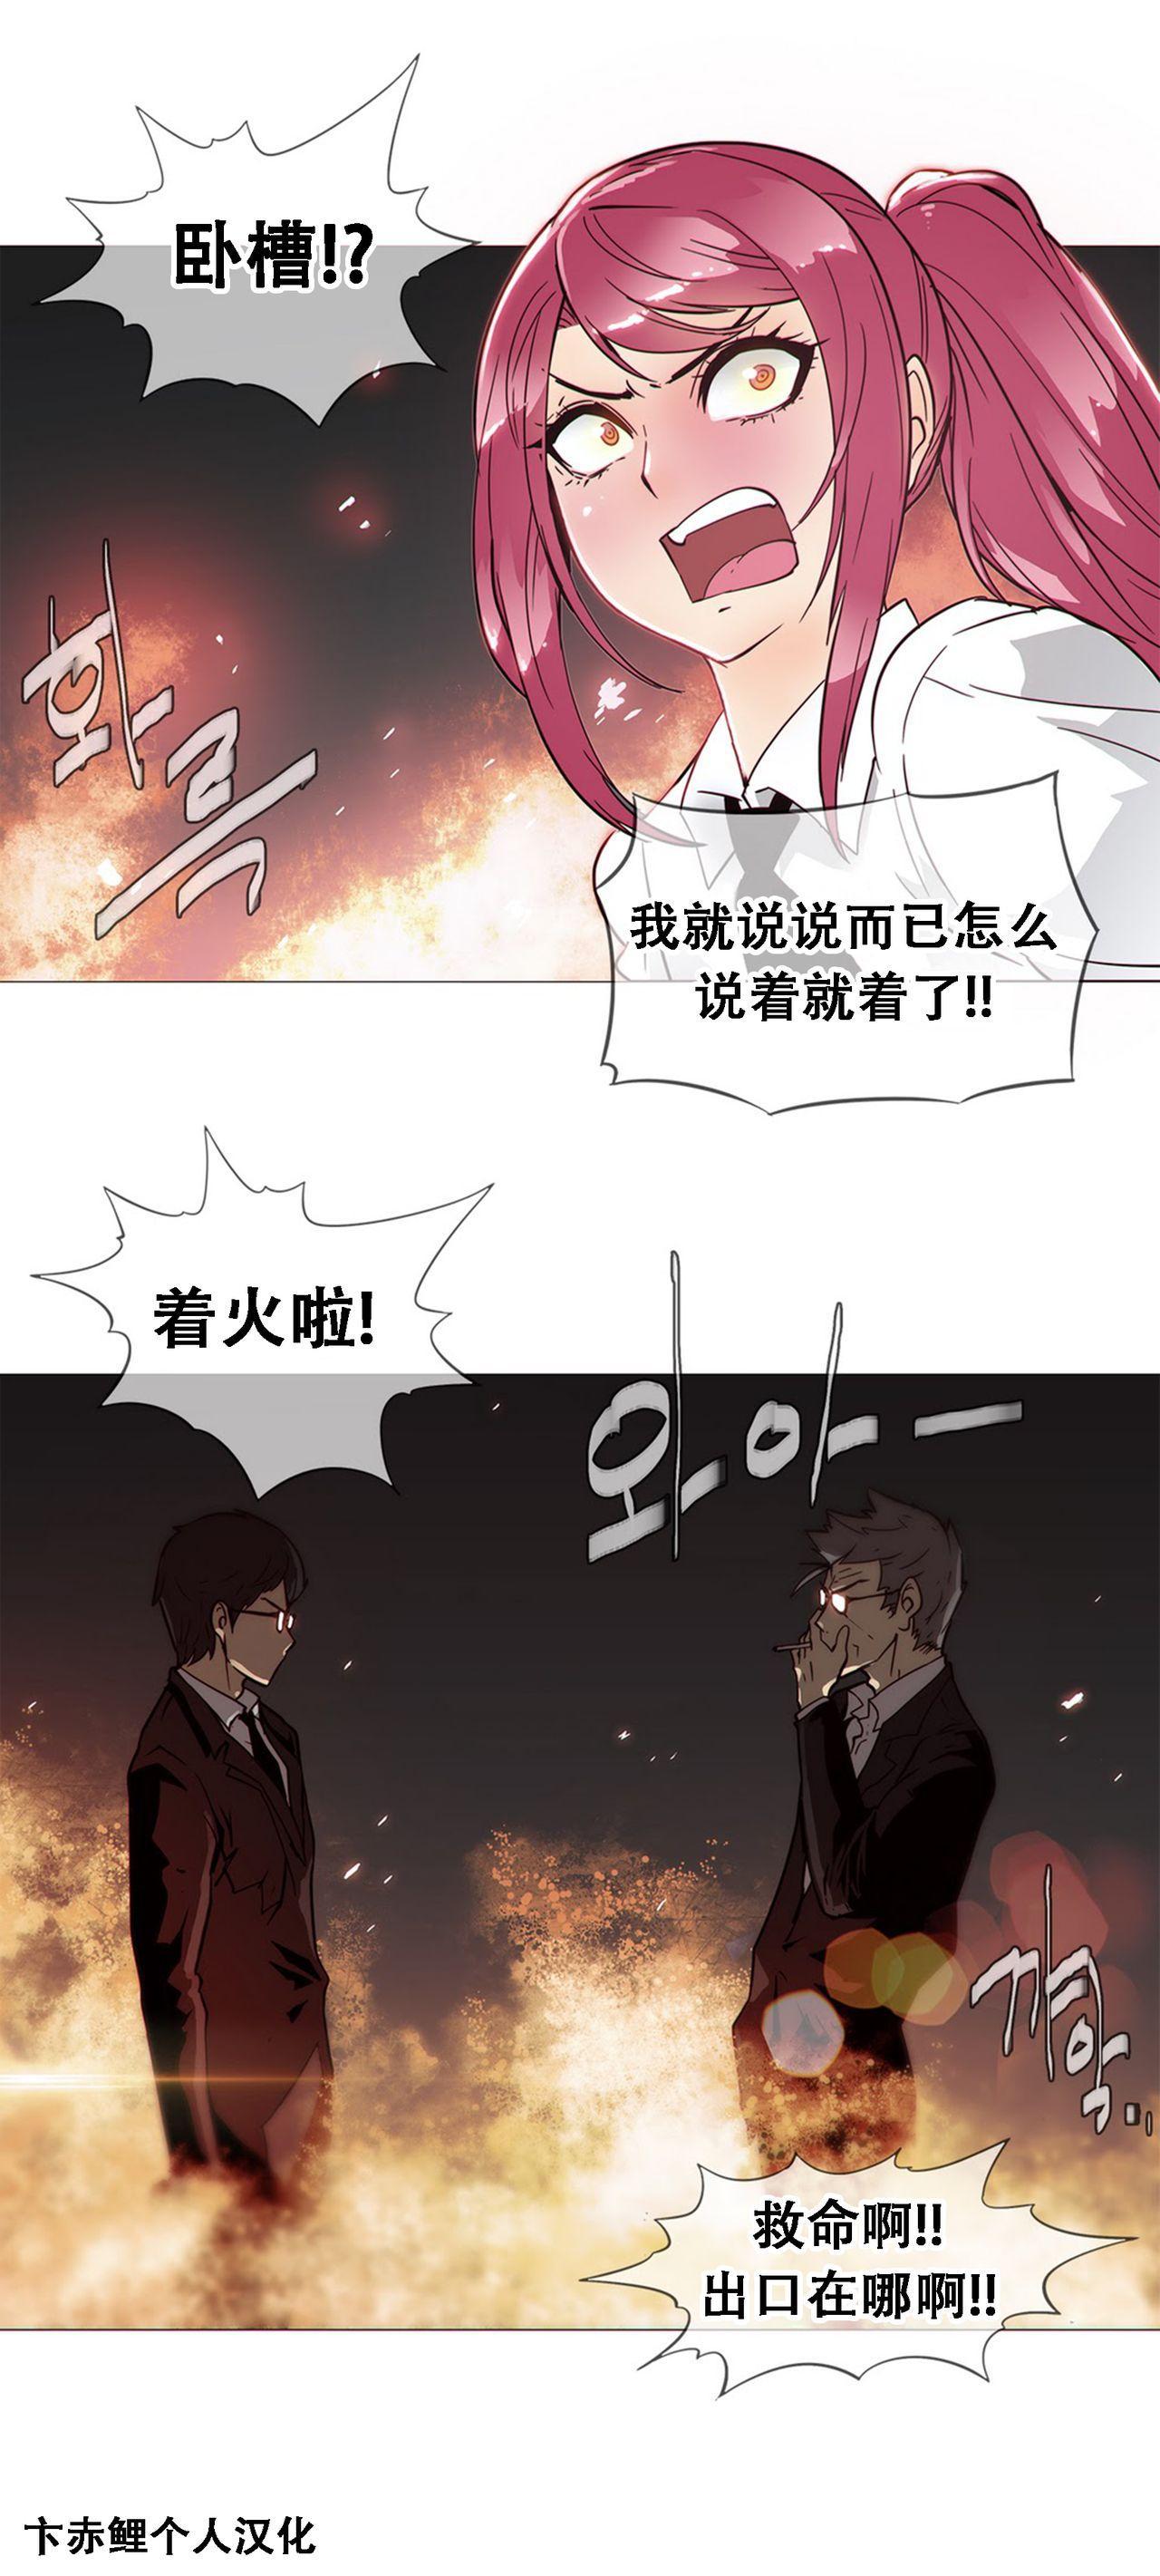 HouseHold Affairs 【卞赤鲤个人汉化】1~33话(持续更新中) 368